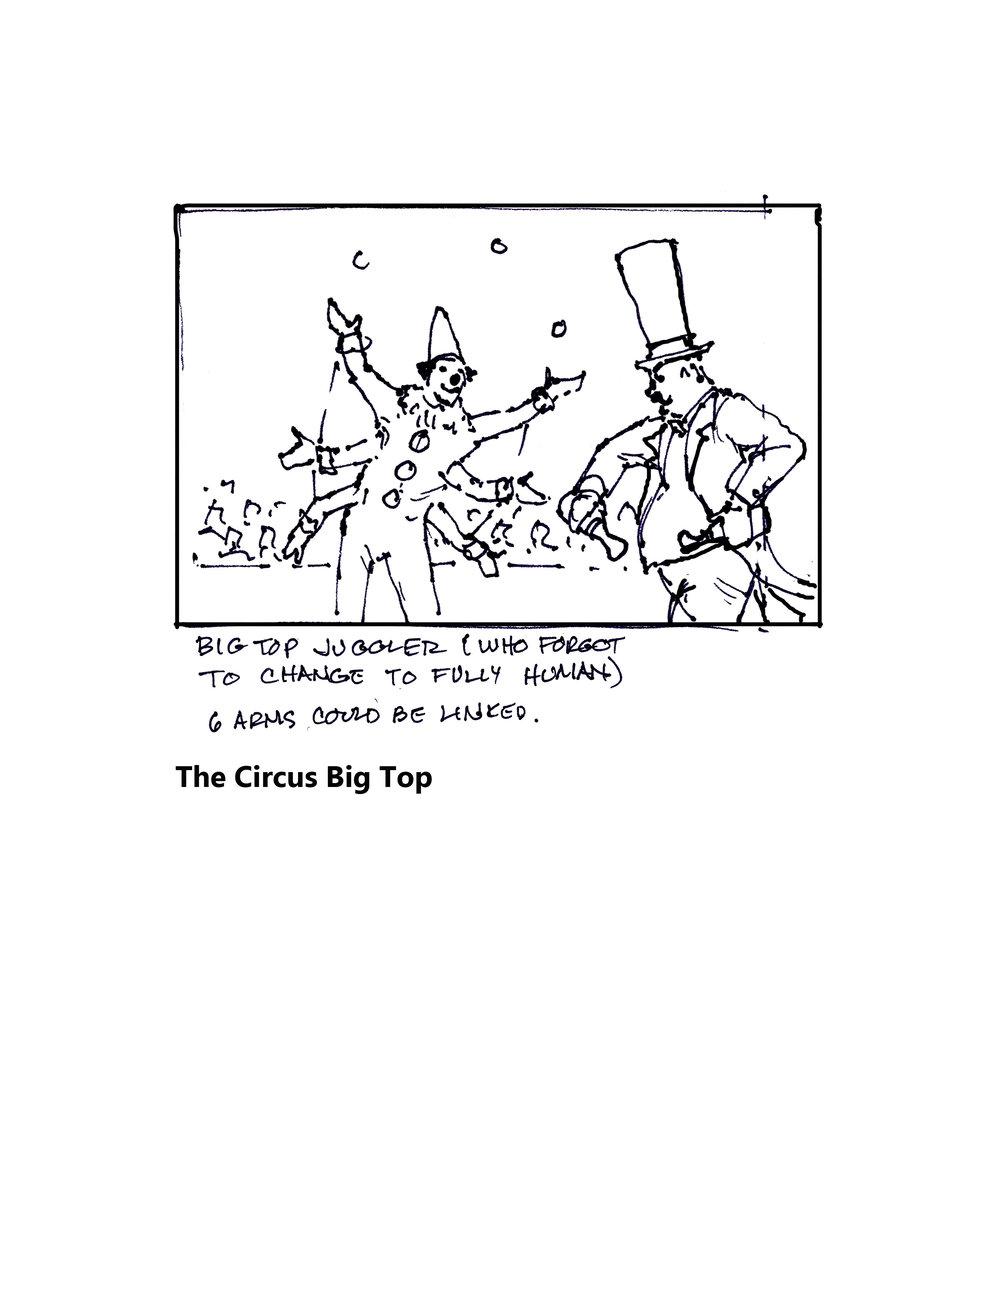 The Circus Big Top 2.jpg